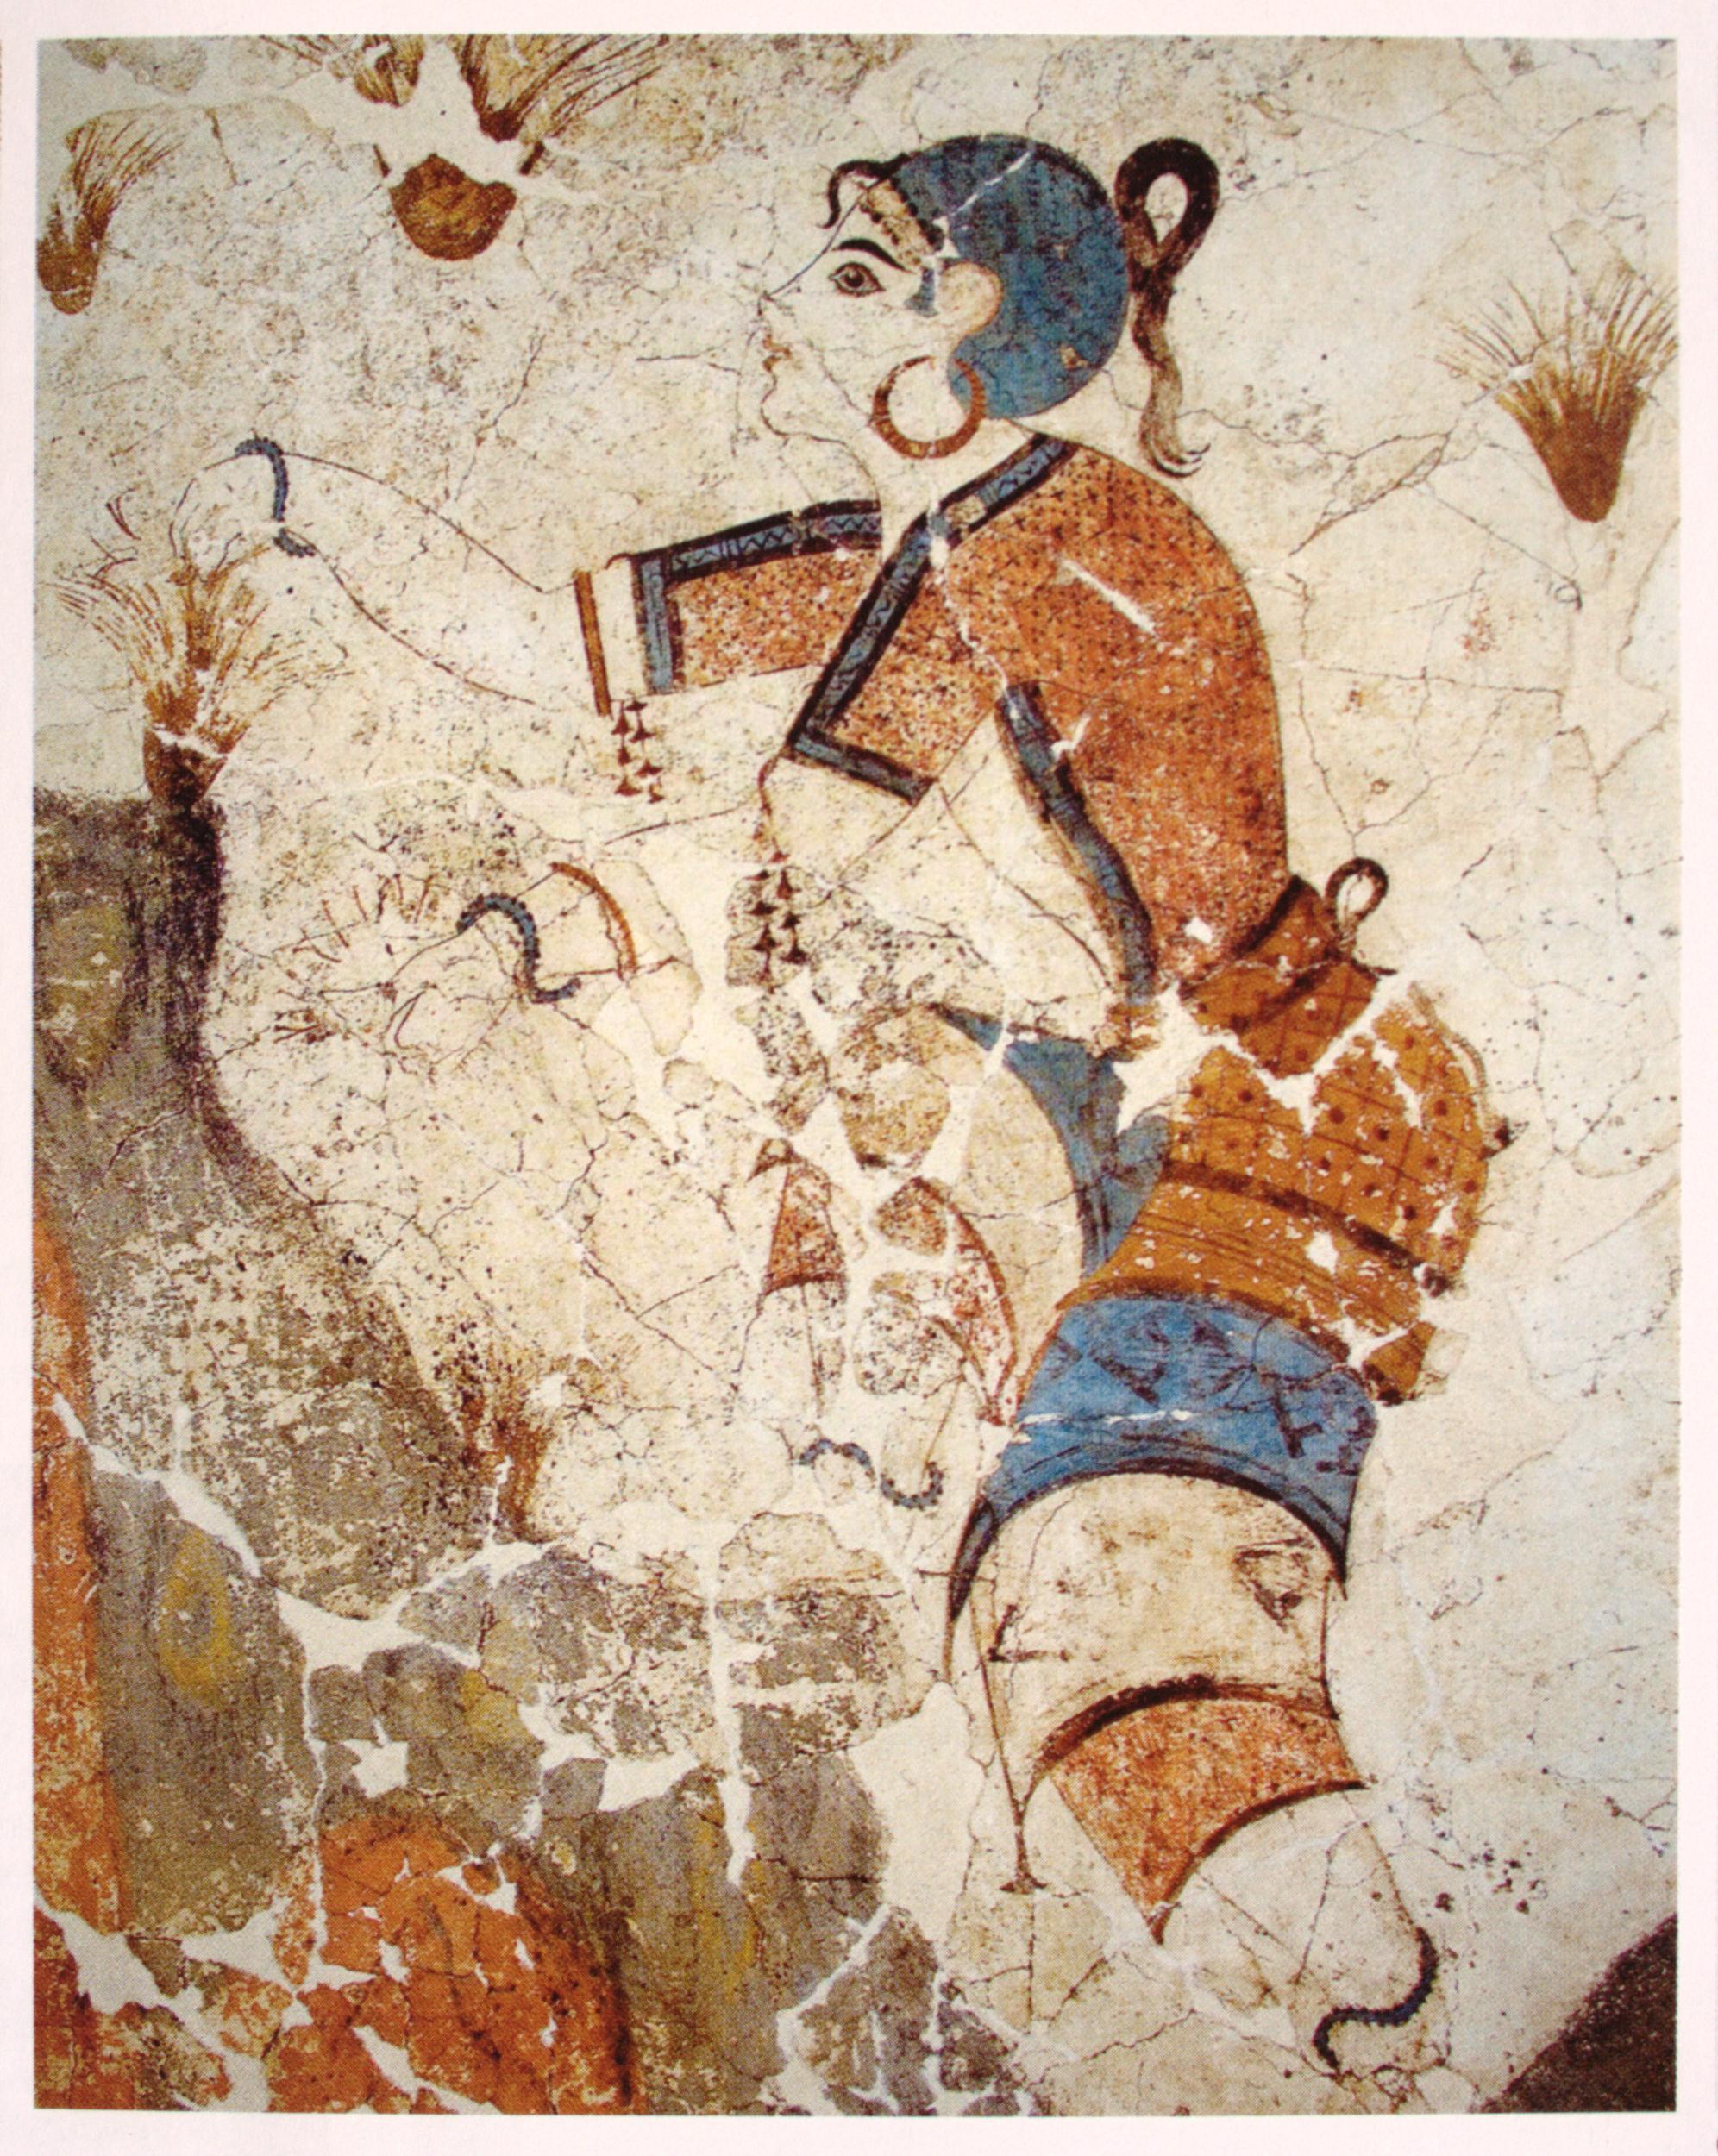 Cueilleuse_de_safran,_fresque,_Akrotiri,_Grèce.jpg